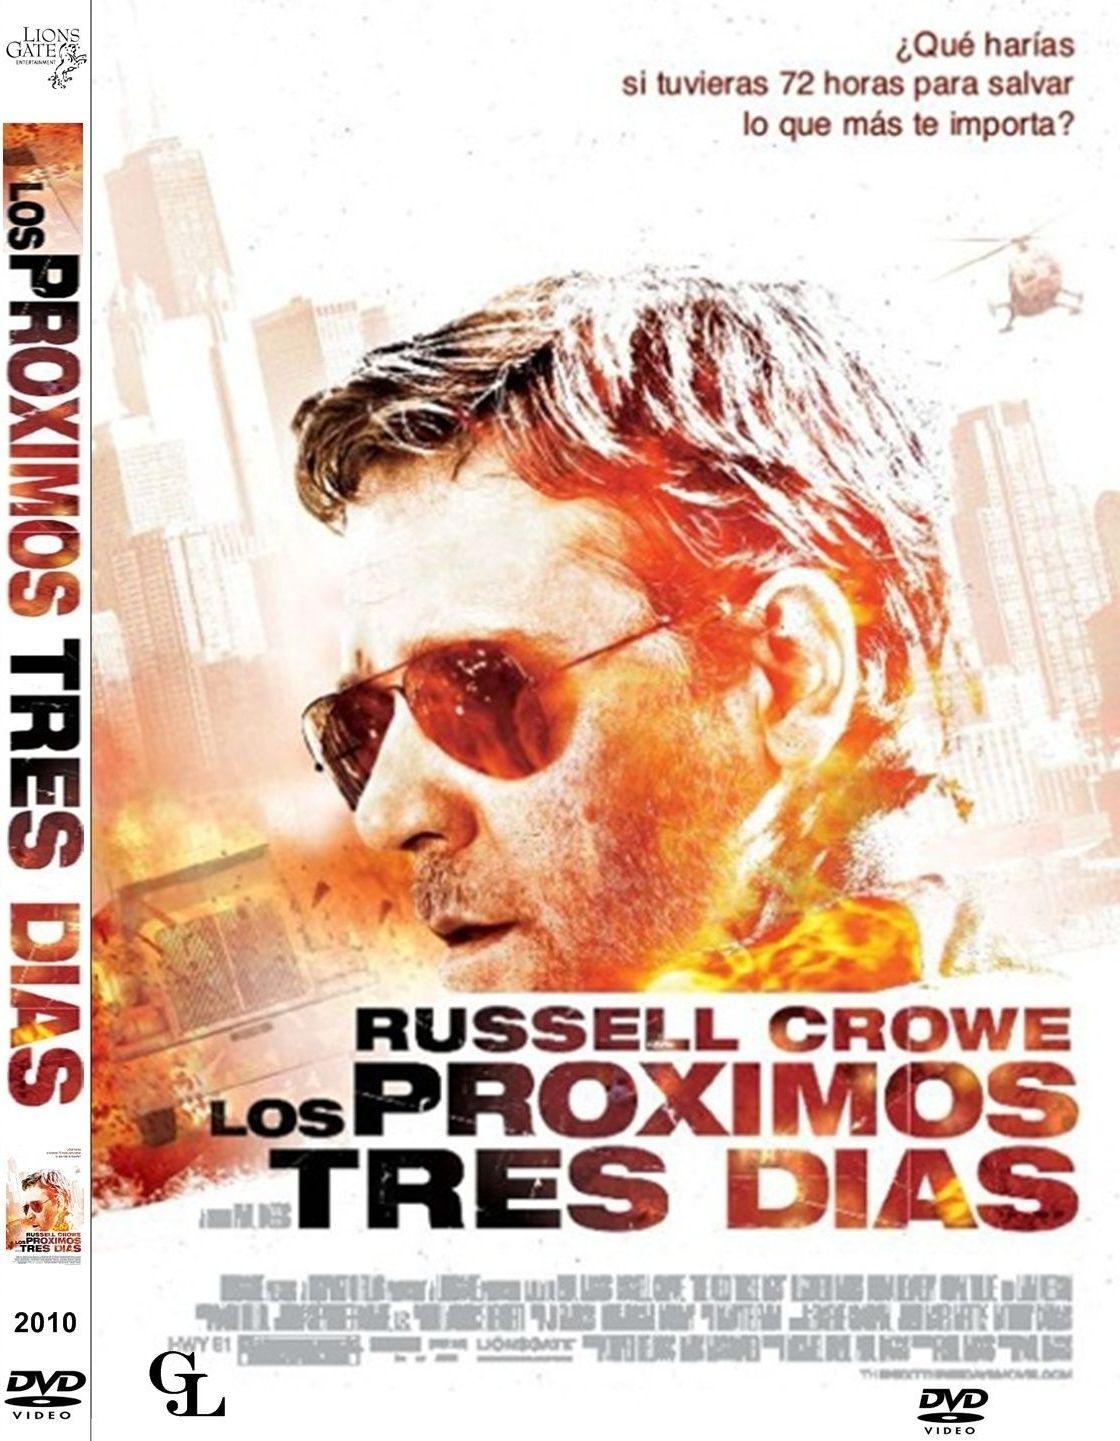 http://2.bp.blogspot.com/-W8uj1_2J72E/TWzjrpNtEBI/AAAAAAAADoQ/S-Y8mcojlSg/s1600/Los_Proximos_Tres_Dias.jpg